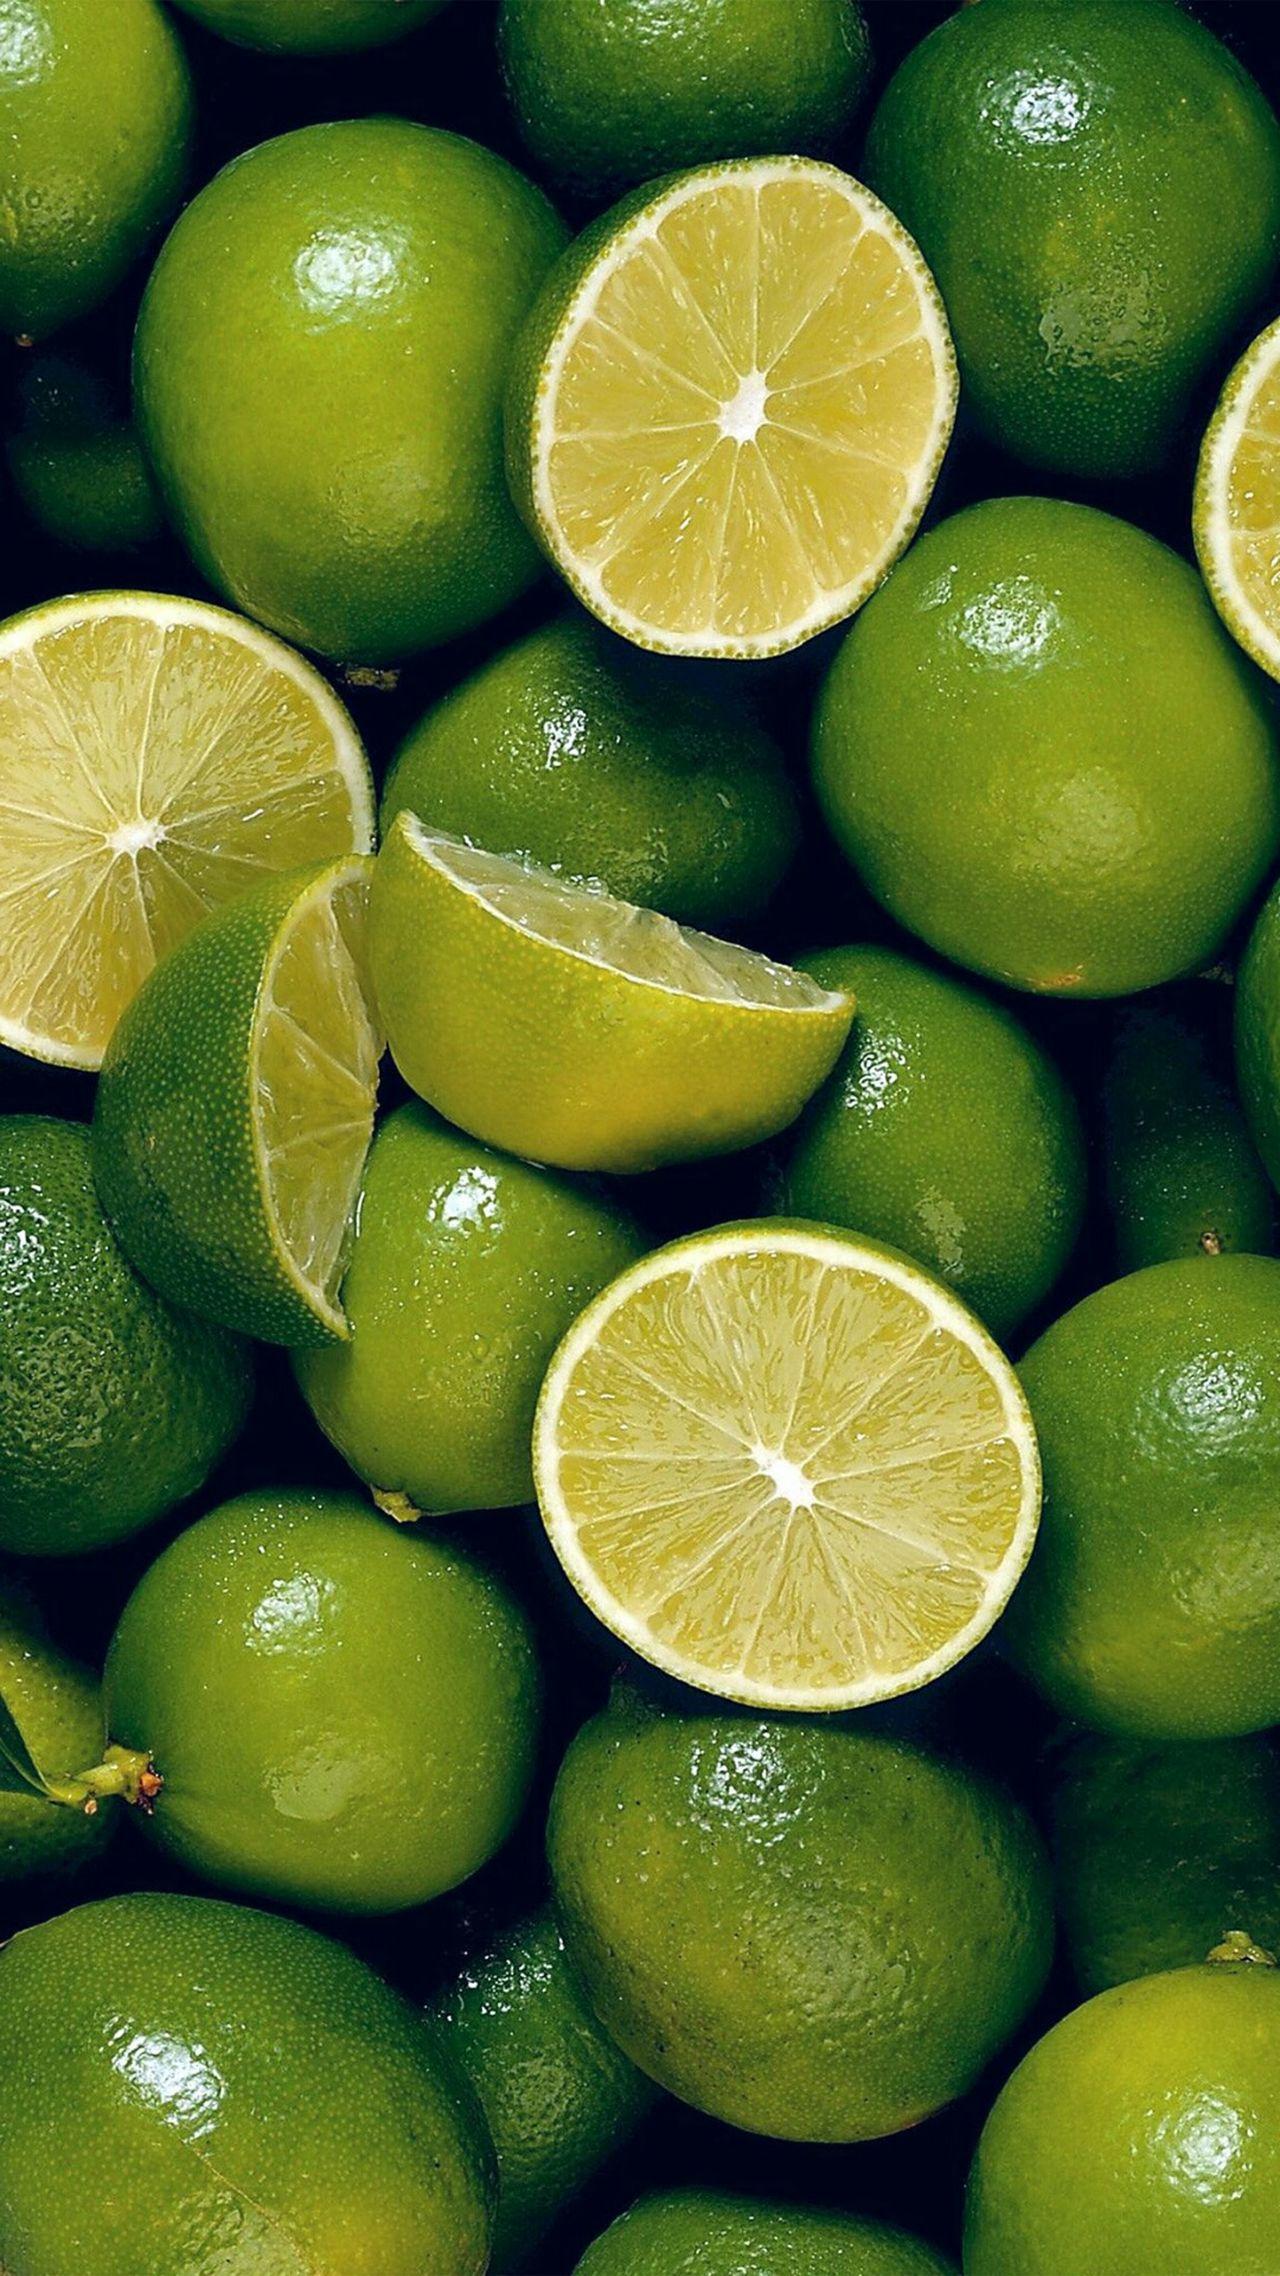 Fruit Citrus Fruit Lemon Food Freshness Healthy Eating Juicy Yellow Full Frame SLICE Close-up No People Sour Taste Grapefruit Indoors  Day